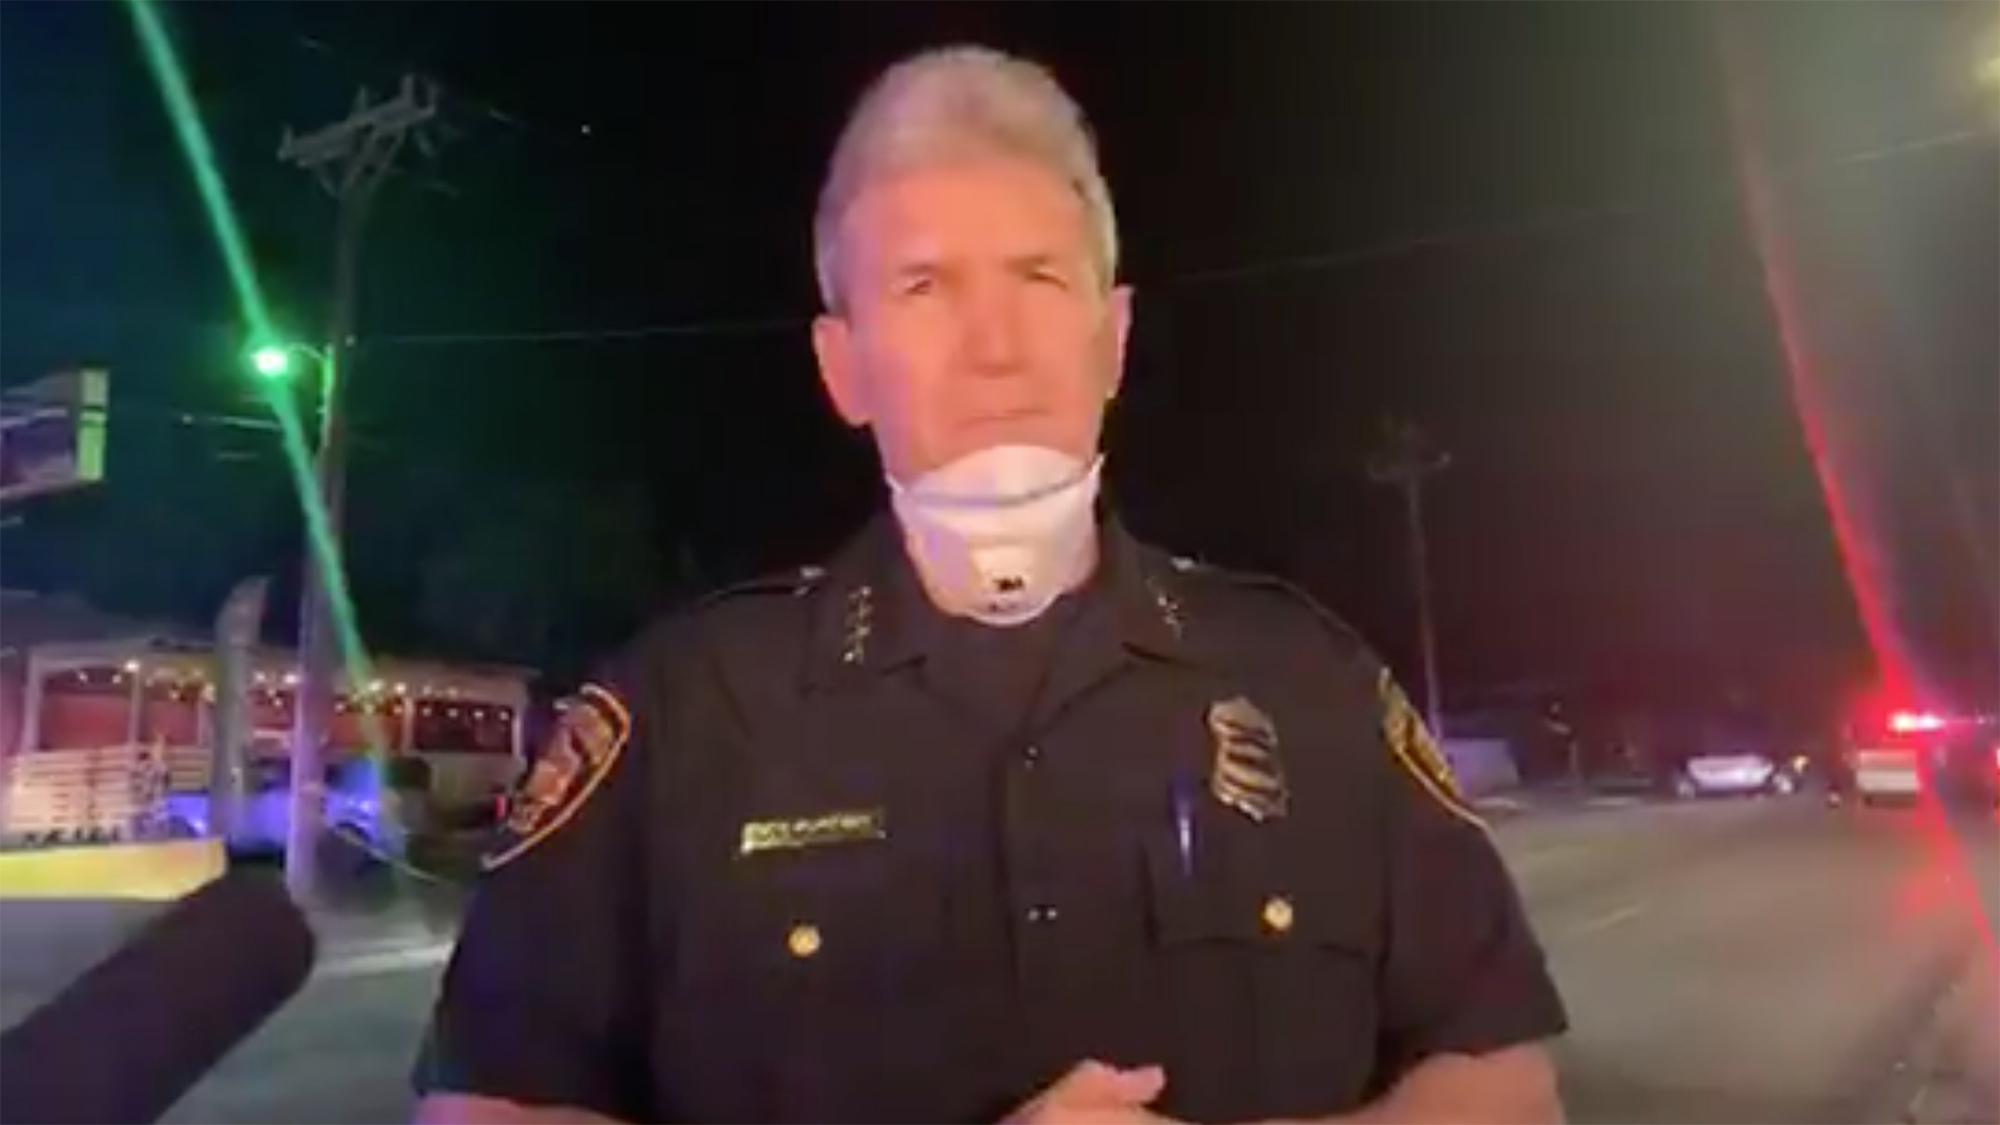 Chief William McManus gives a media briefing following a shooting with multiple victims in San Antonio, Texas. (San Antonio Police Department)